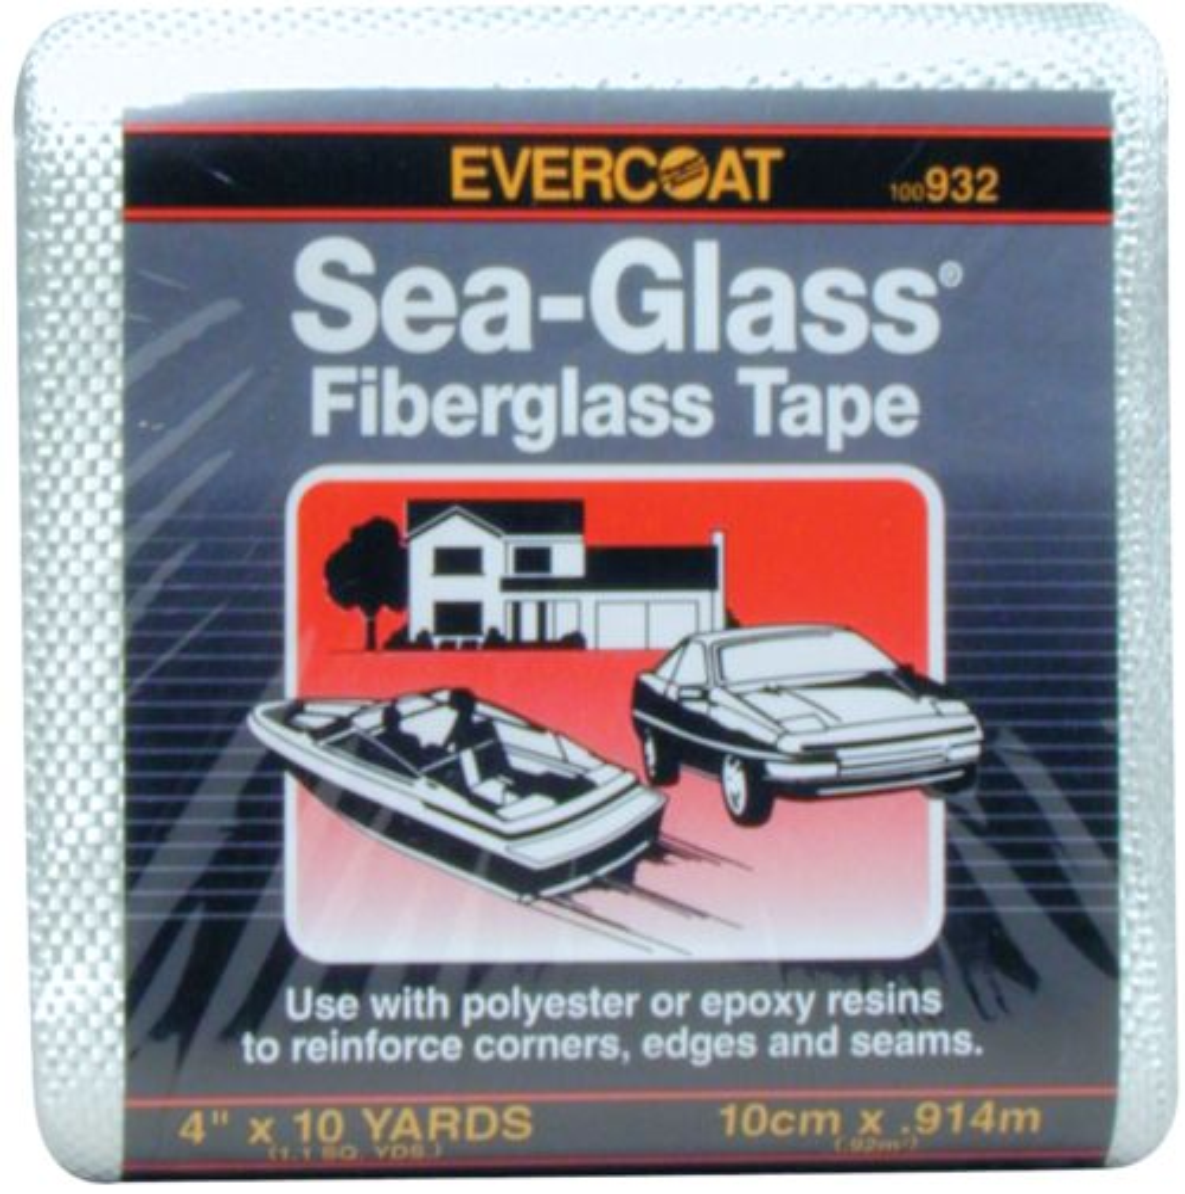 Evercoat Sea-Glass Fiberglass Tape